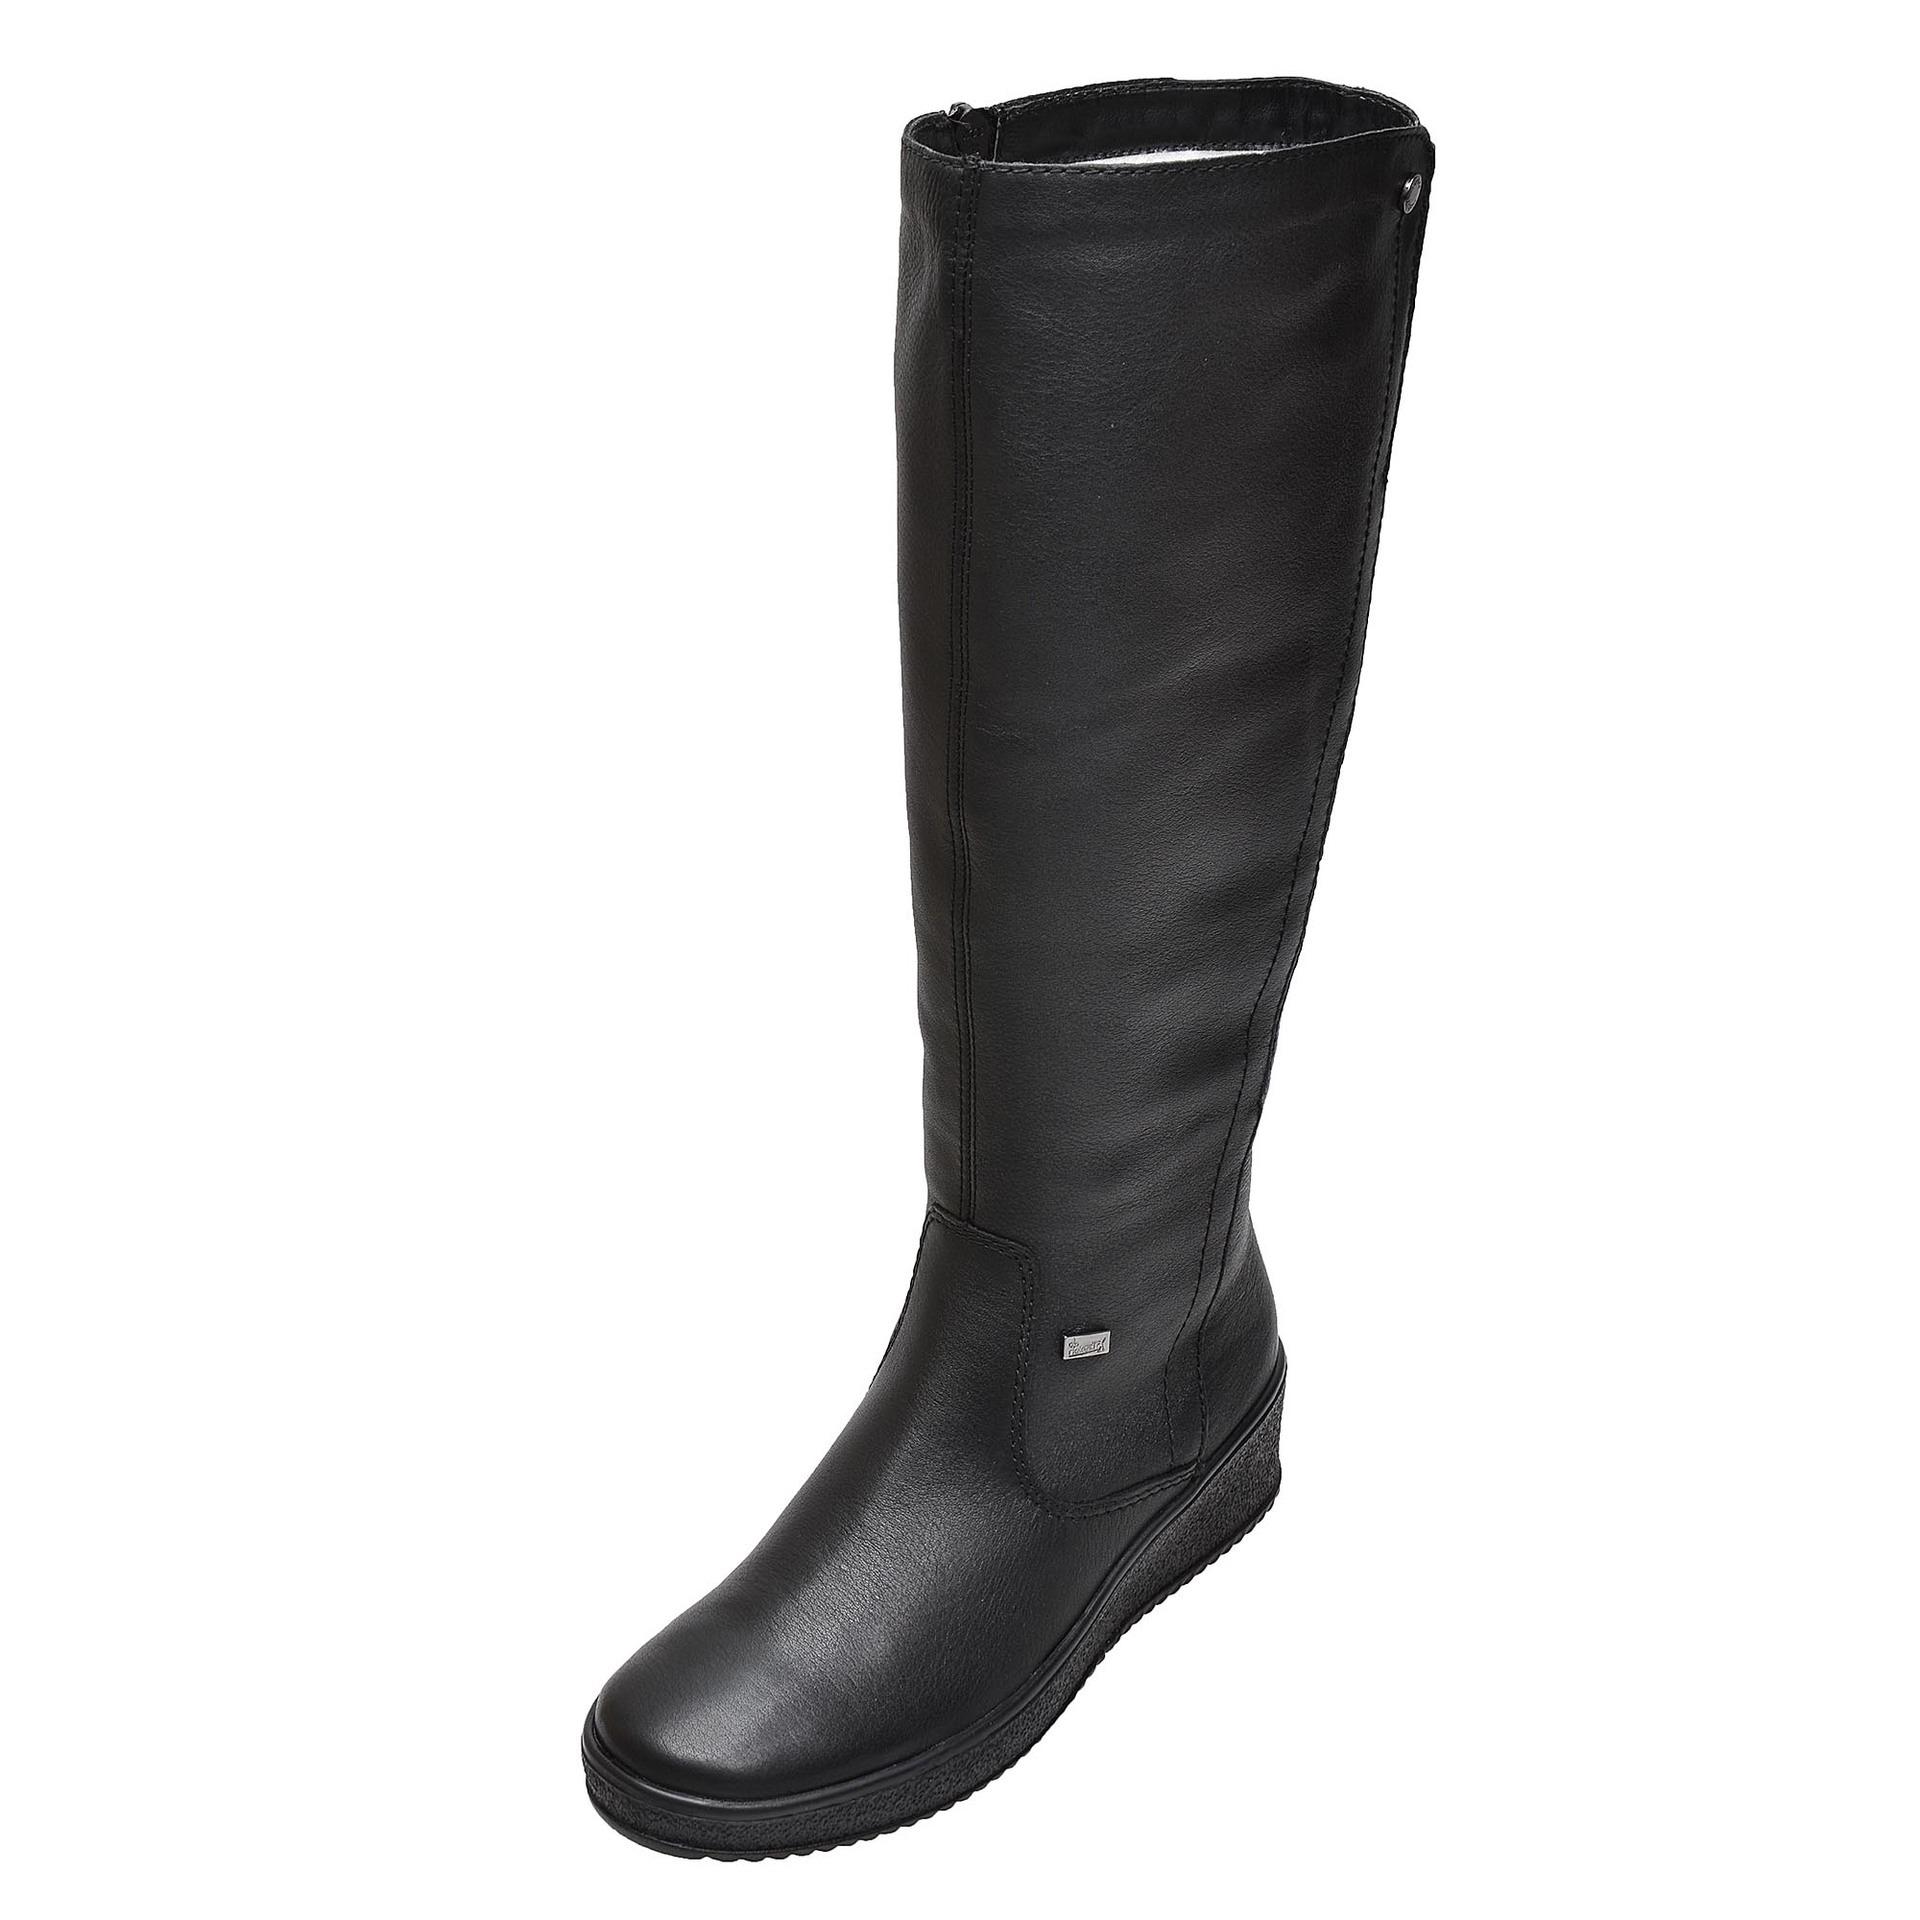 Soňa - Dámska obuv - Čižmy - Dámska čižma vysoká zateplená na ... 97a0232b105